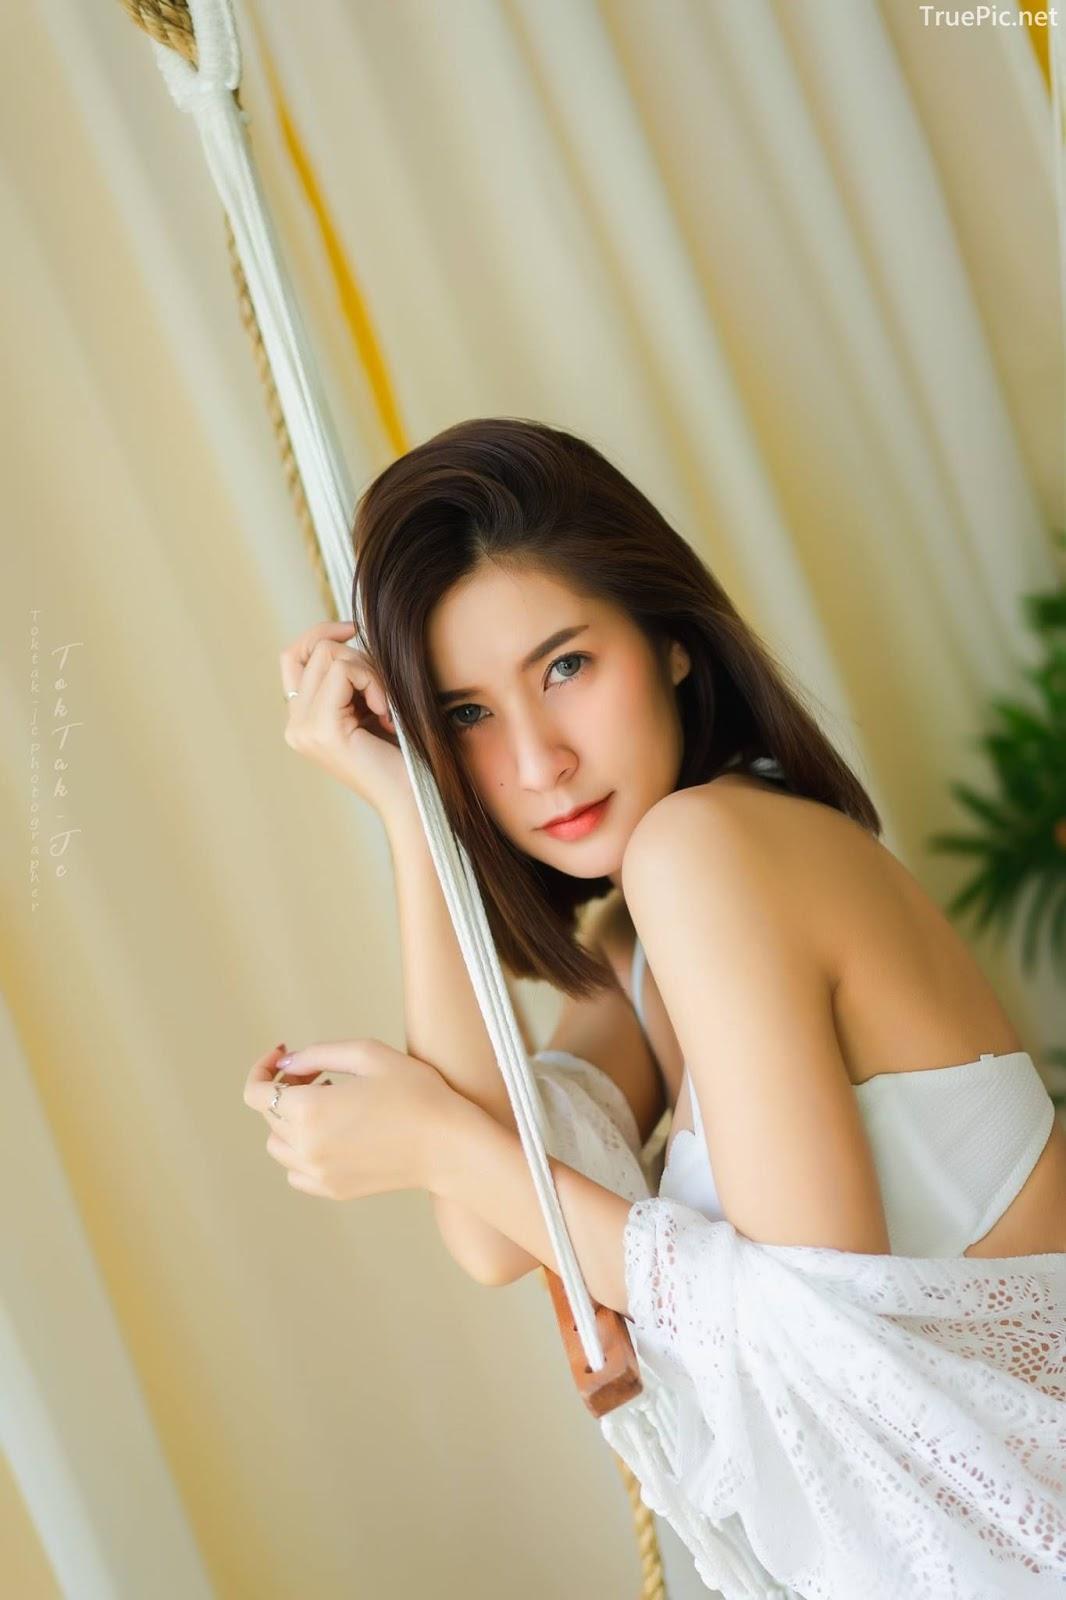 Thailand hot model MIldd Thanyarath Sriudomloert - Sexy 2 Piece Swimsuits - Picture 8